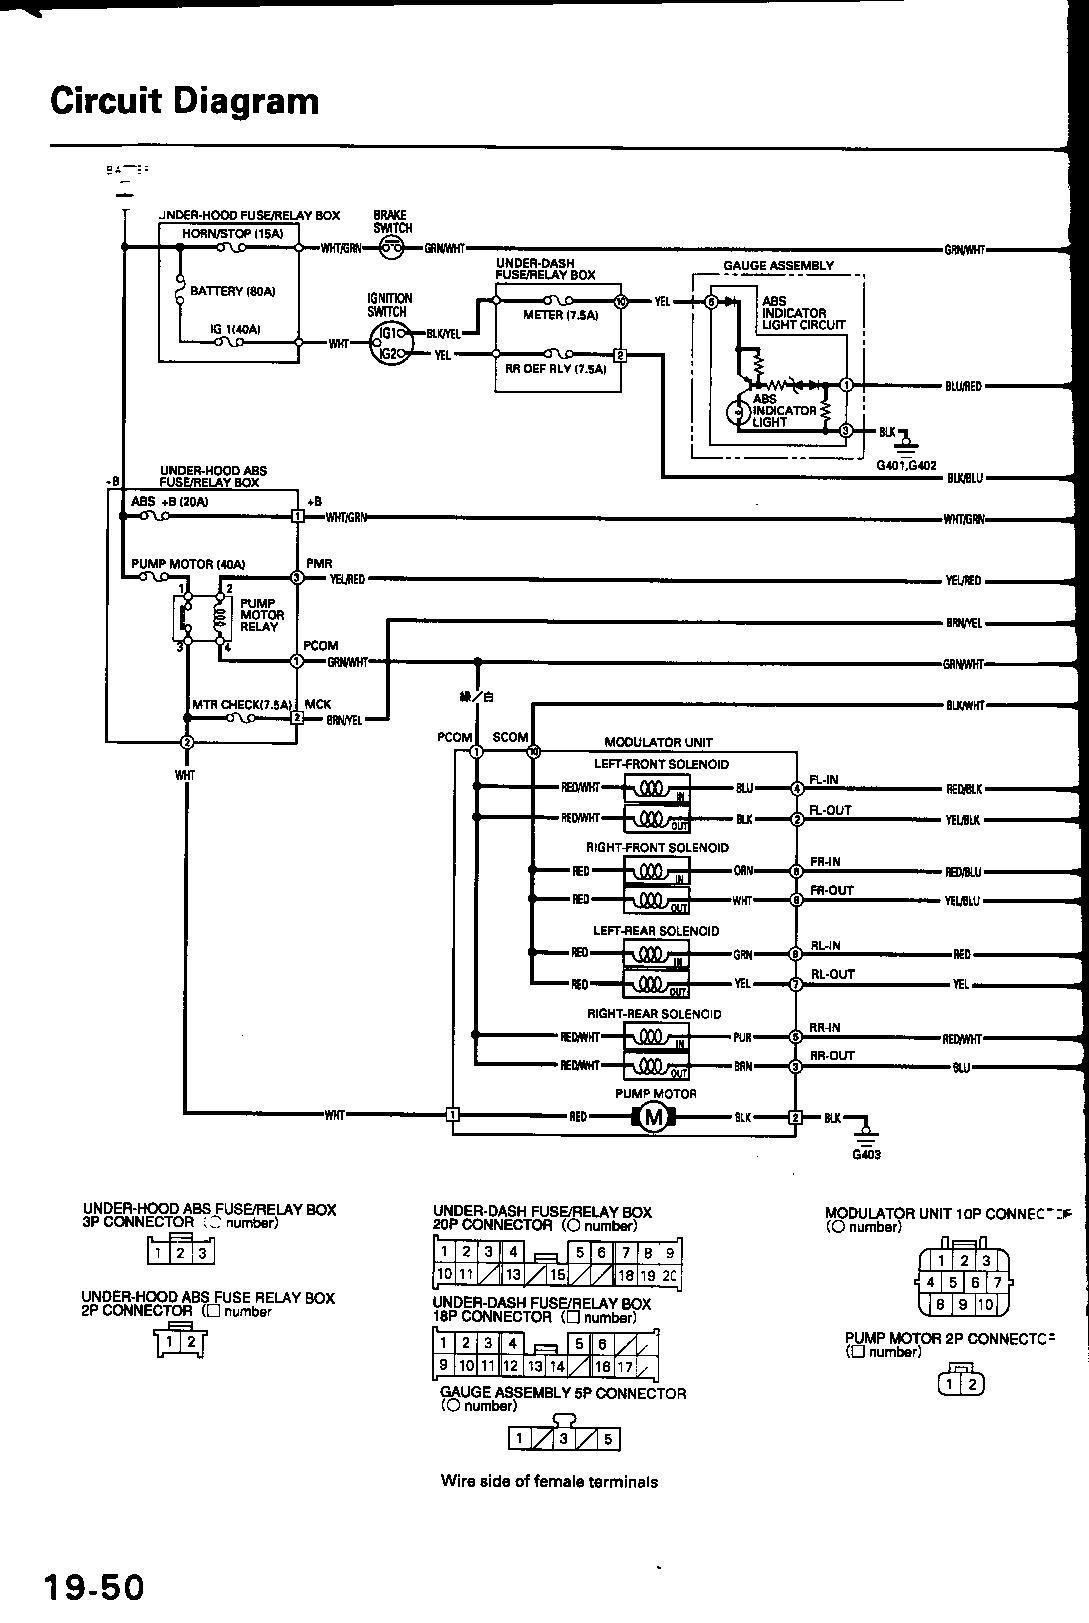 1995 Acura Integra Abs Wiring Diagram - 2012 Jeep Fuse Box Layout -  loader.wiringdol.jeanjaures37.frWiring Diagram Resource